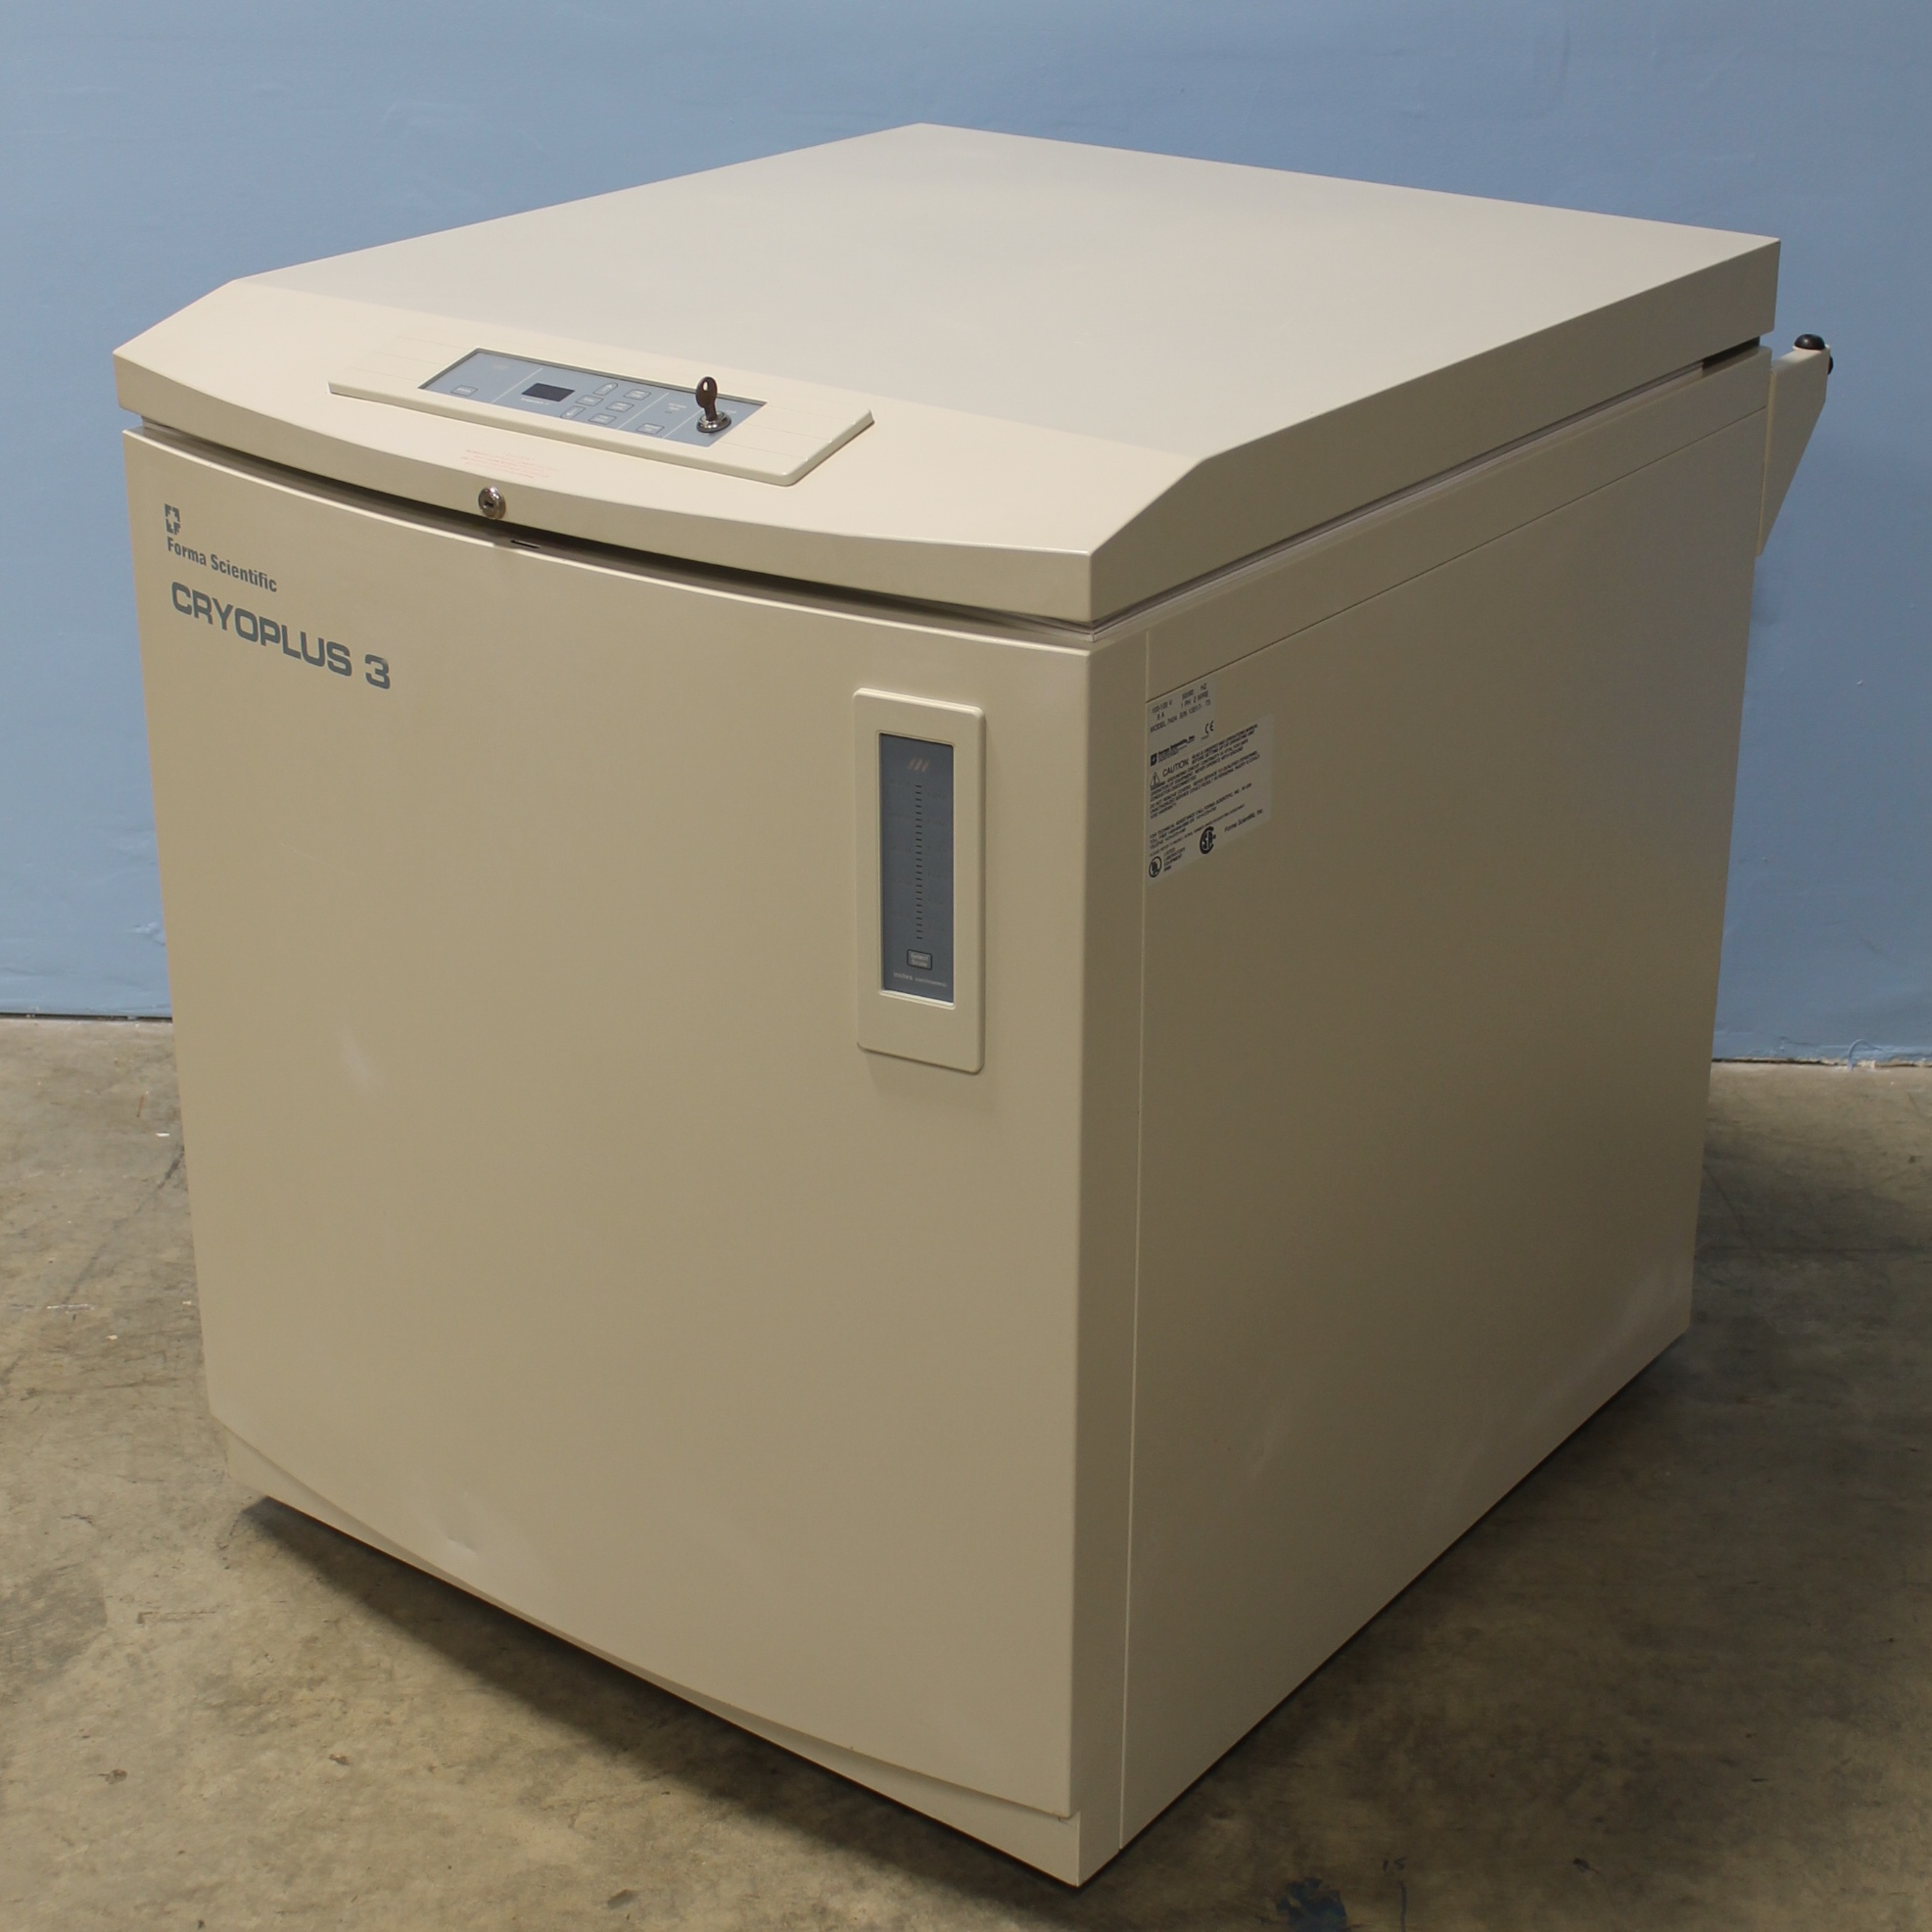 Forma Scientific CryoPlus 3 Storage System Model 7404 Image